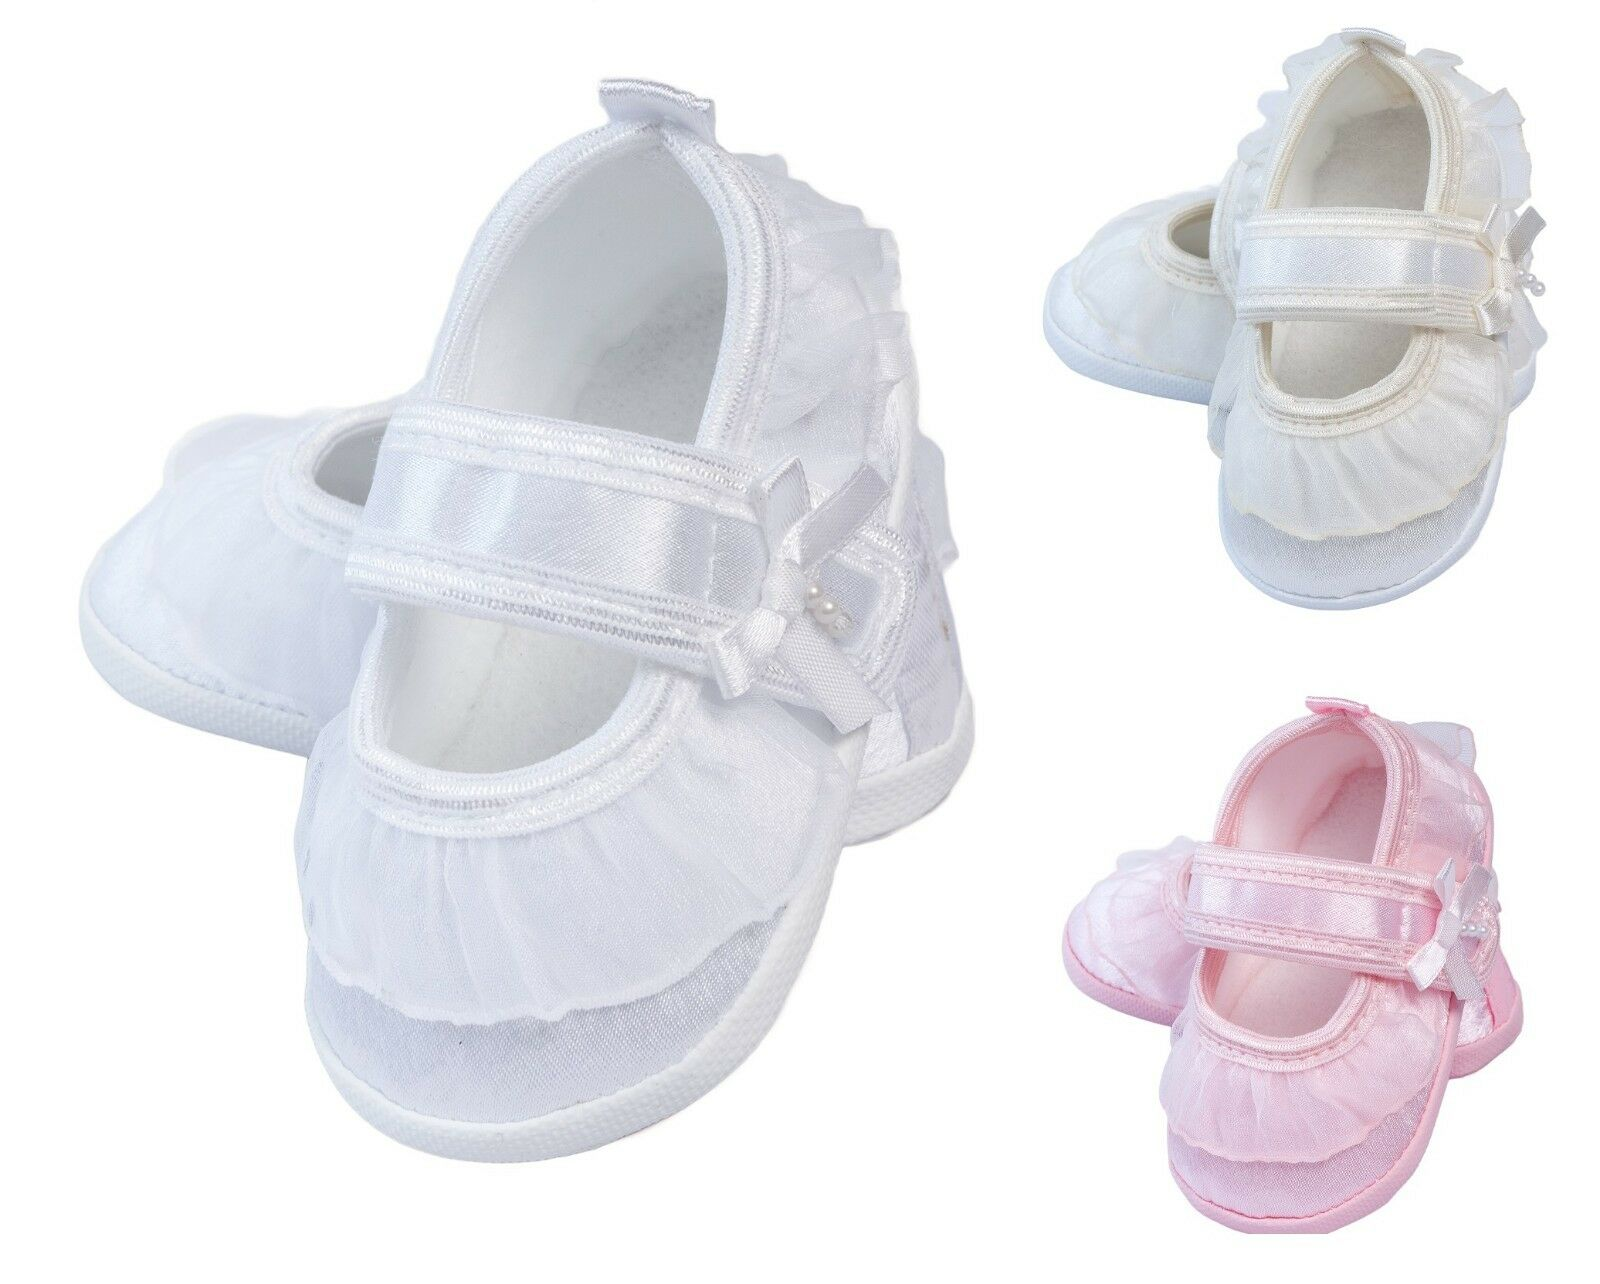 Babyschuhe Ivory Test Vergleich +++ Babyschuhe Ivory